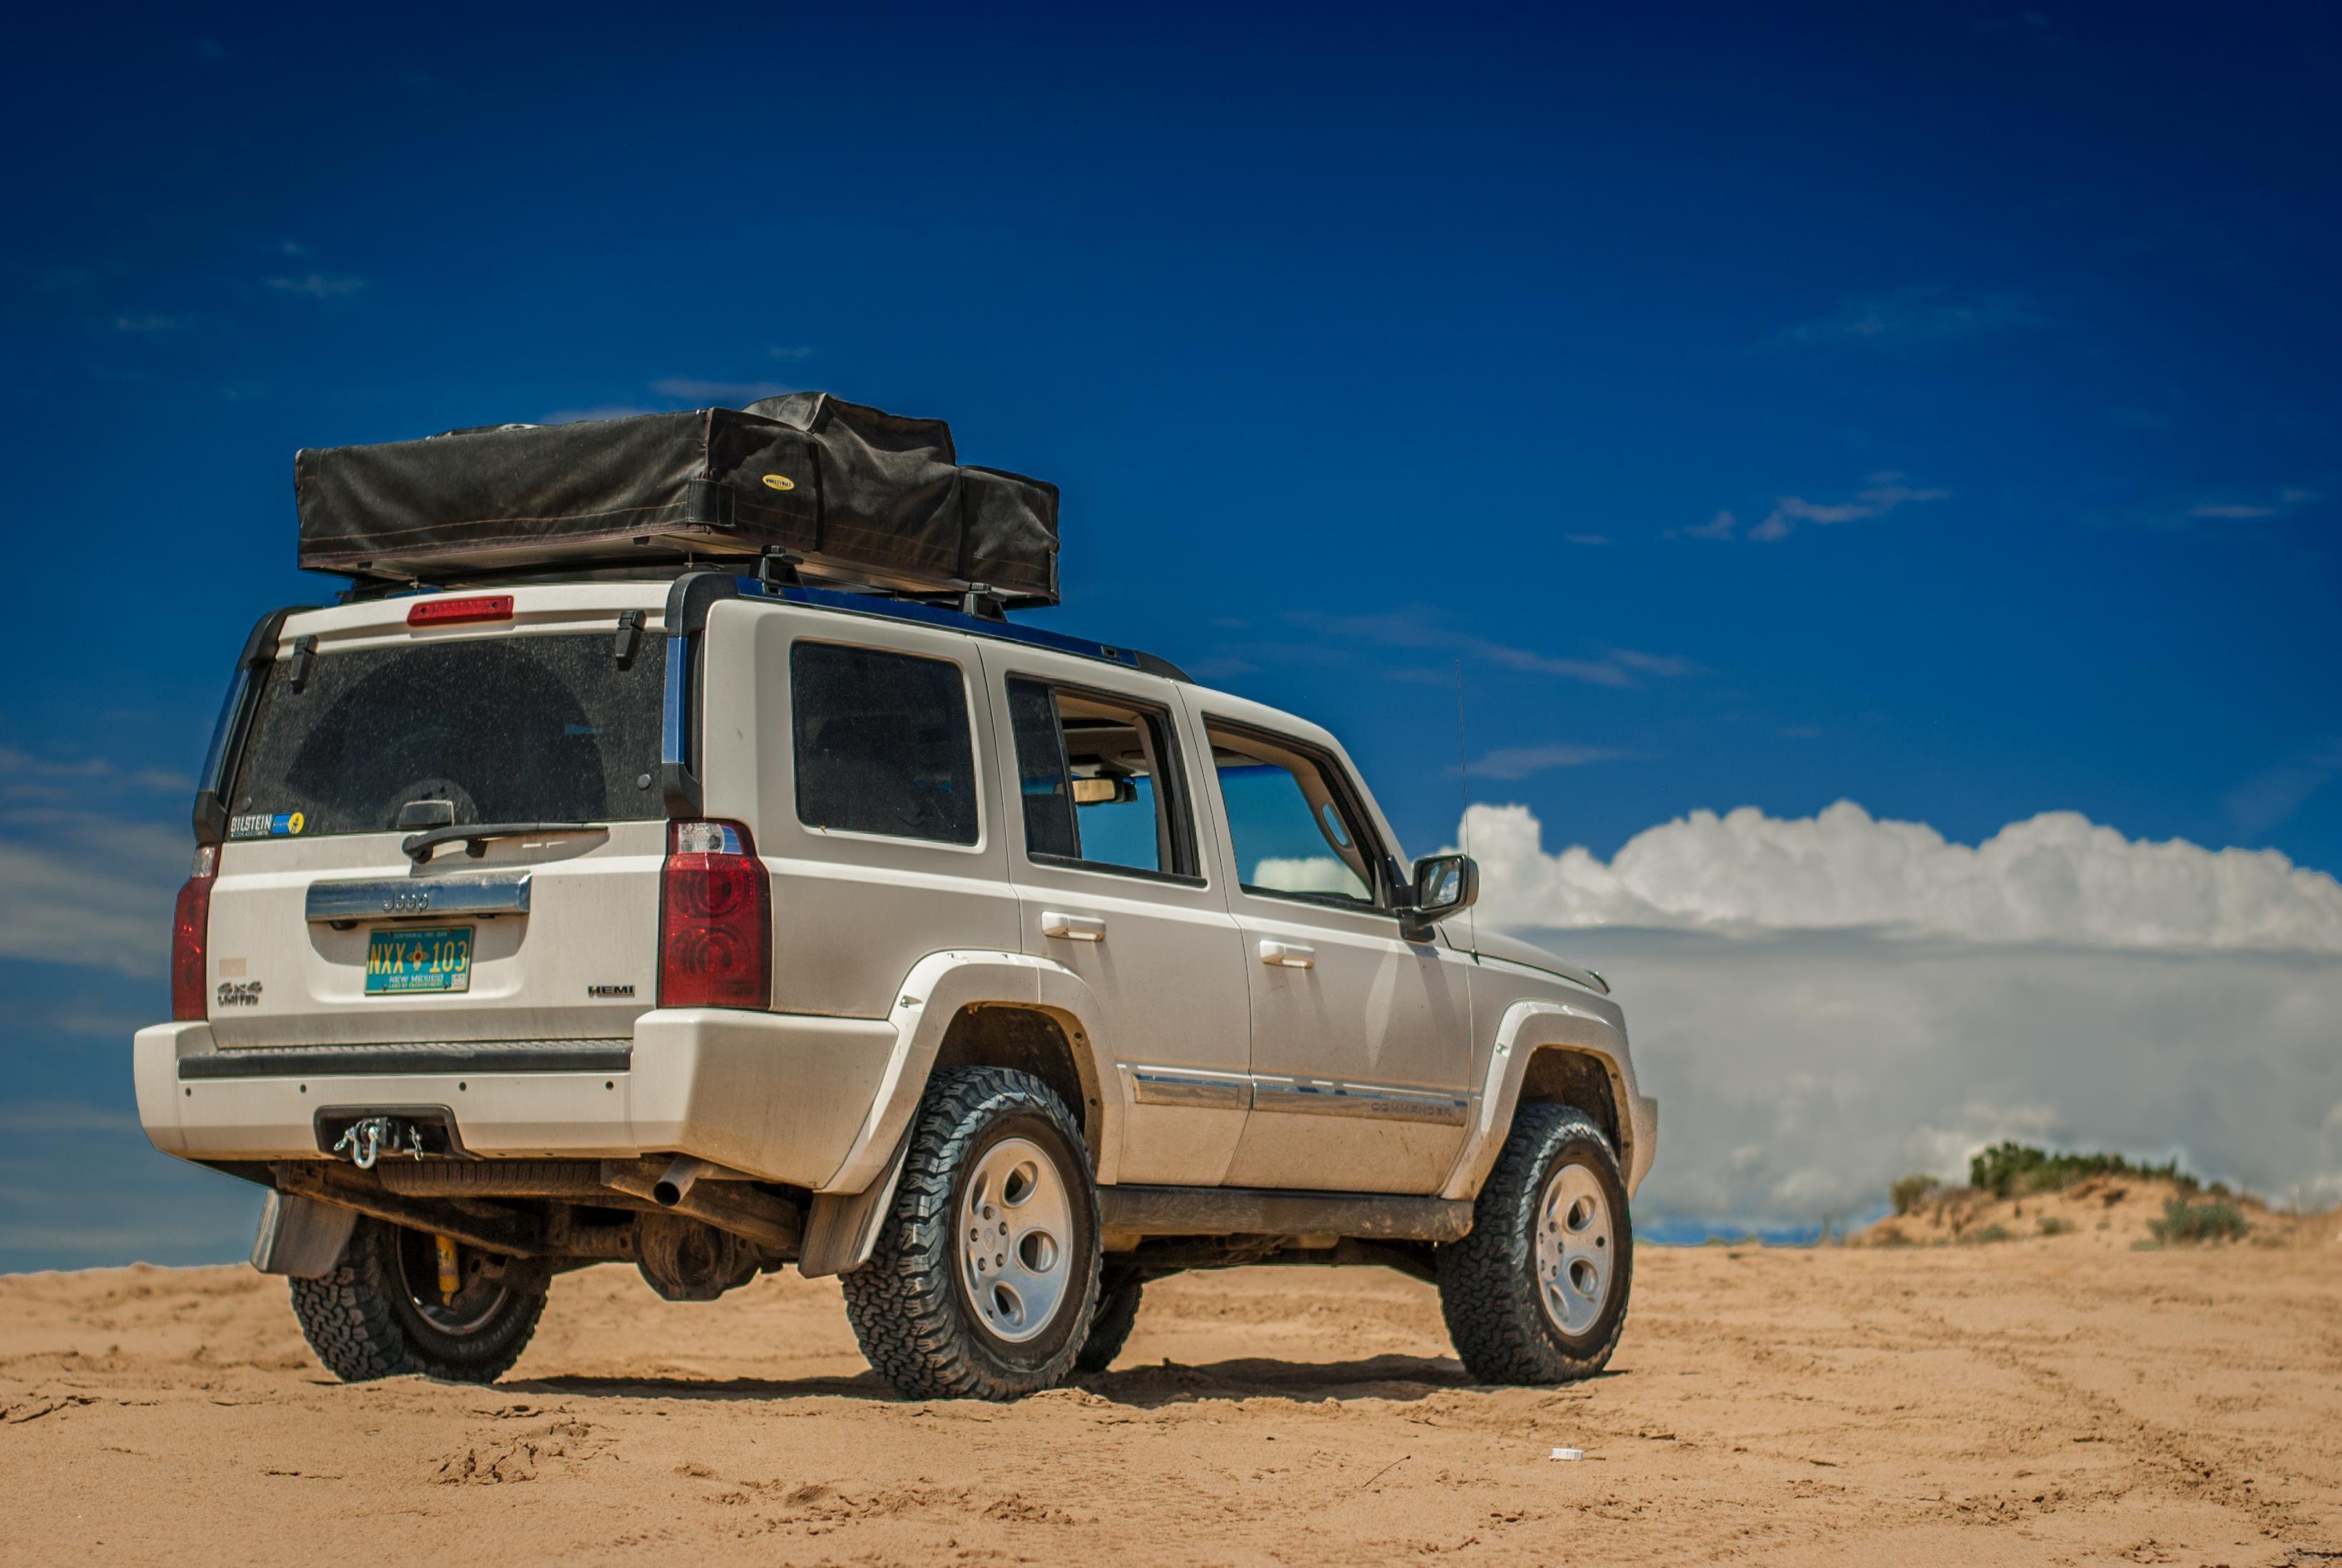 Pin By Perla On Jeep Commander Stuff In 2020 Jeep Commander